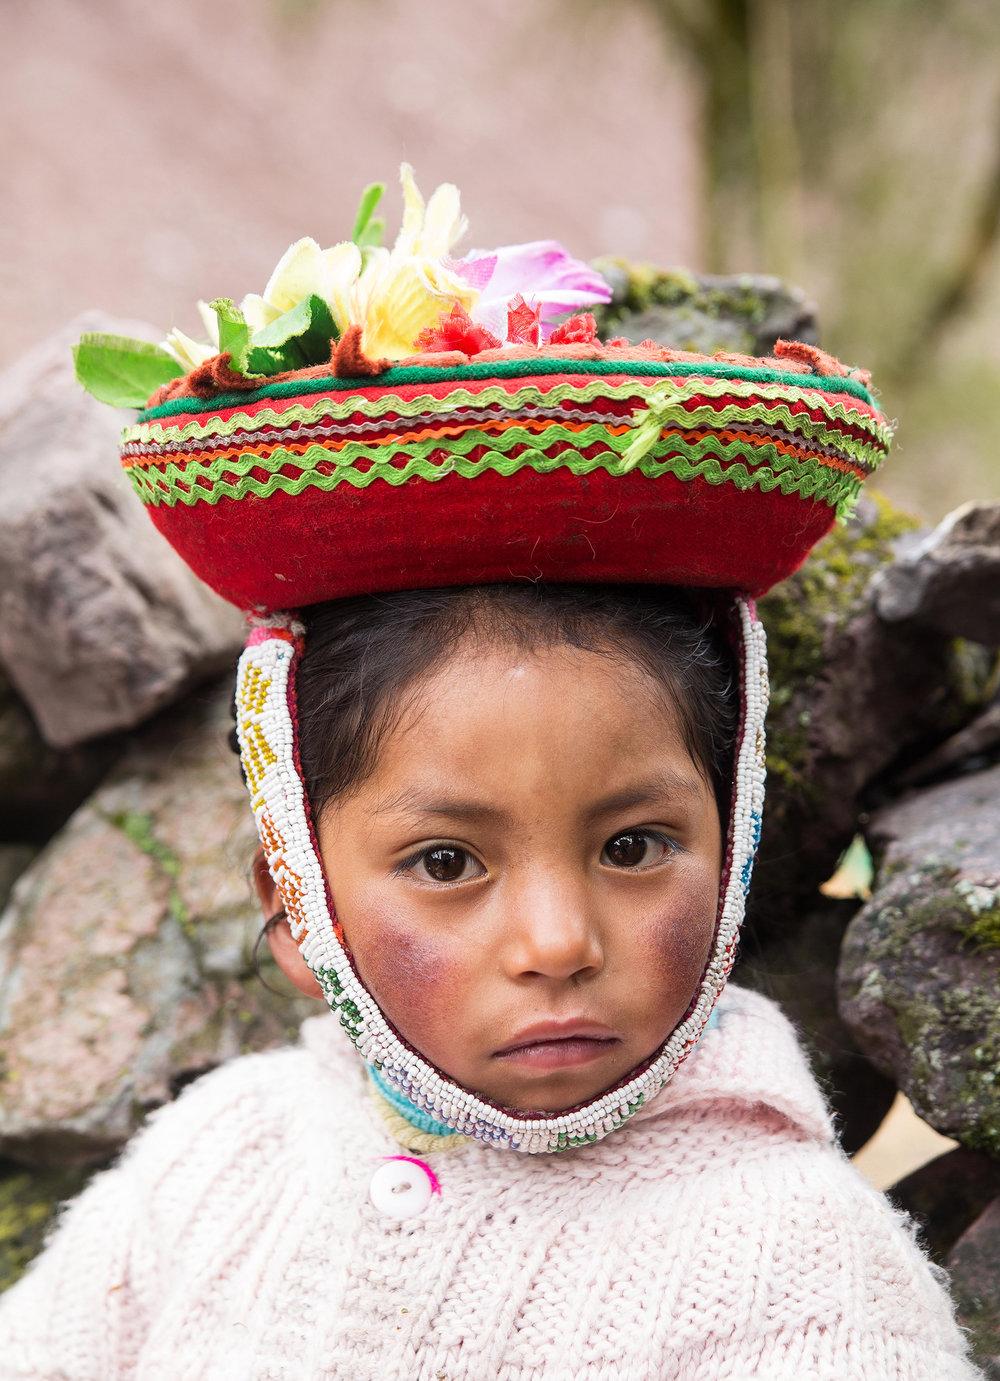 Huachuasi_Sofia_-Peru-3175.jpg